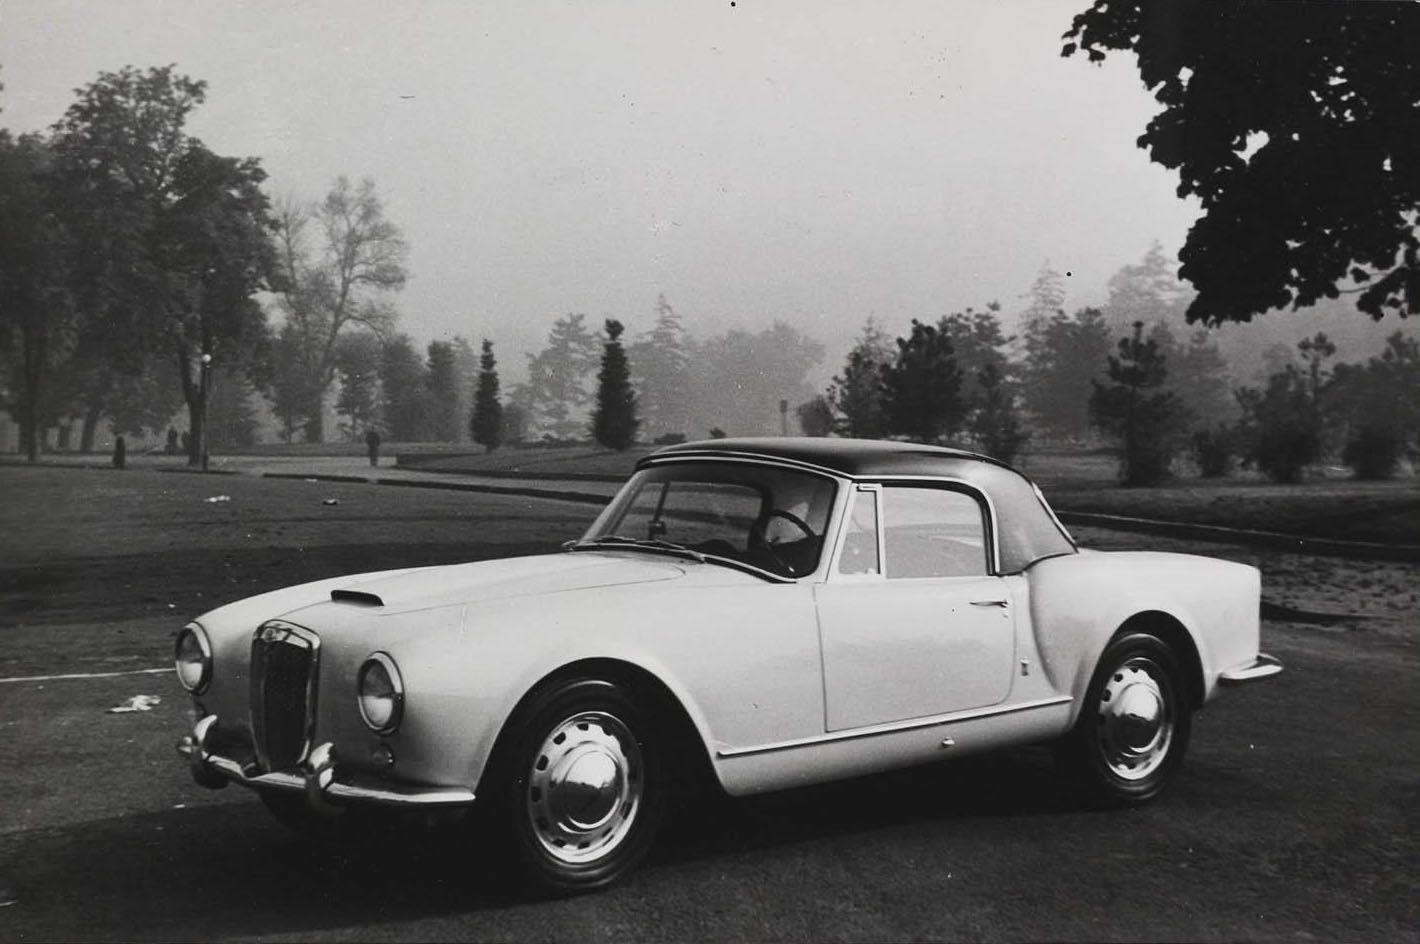 Lancia Aurelia GT 2500 B24 Convertible-Hardtop (Pininfarina), 1956-58